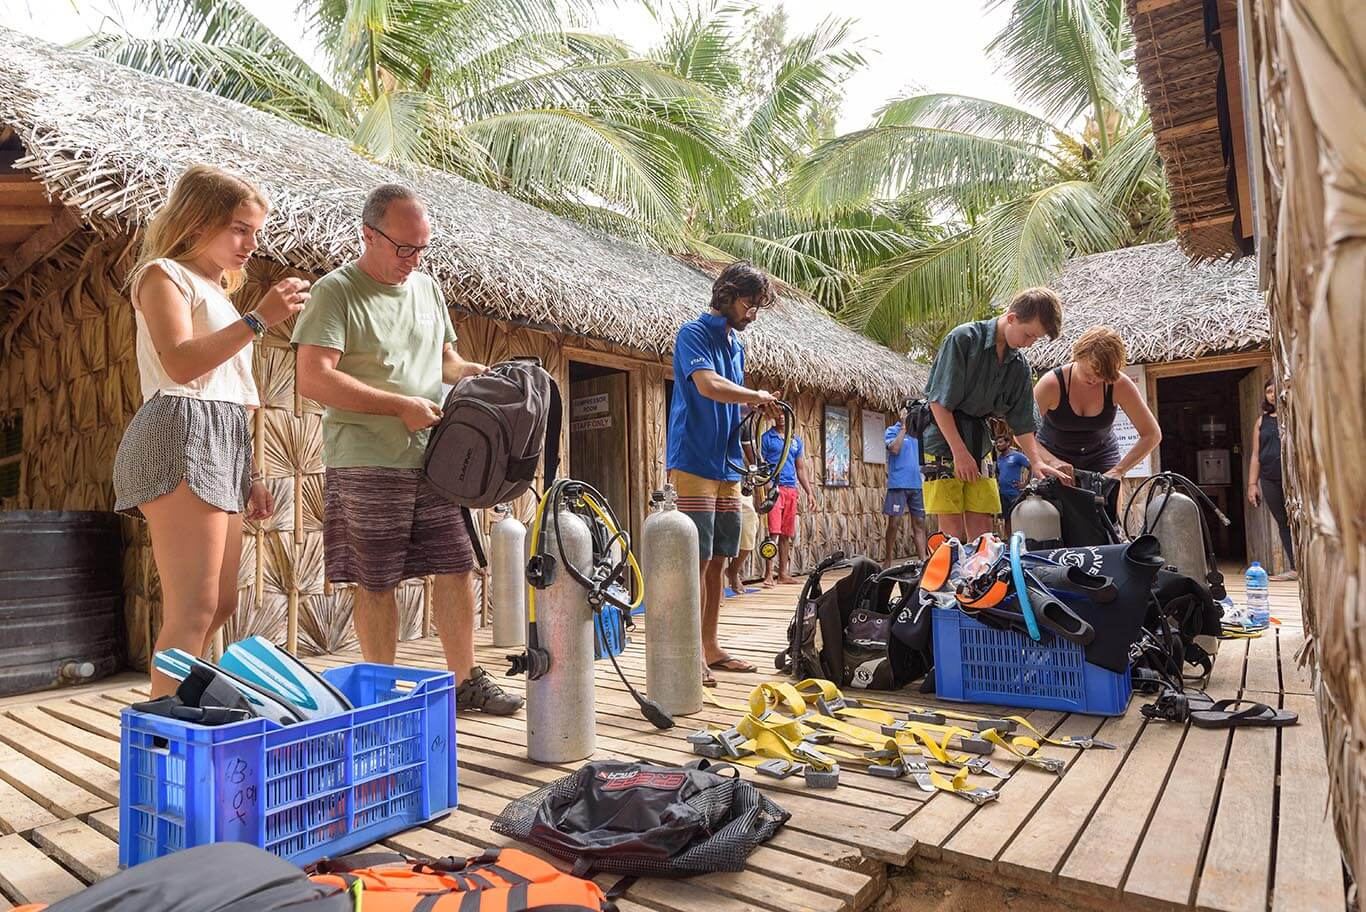 equipment preparation before diving with your Divemaster or PADI Instructor in our Divinguru dive resort in Nilaveli